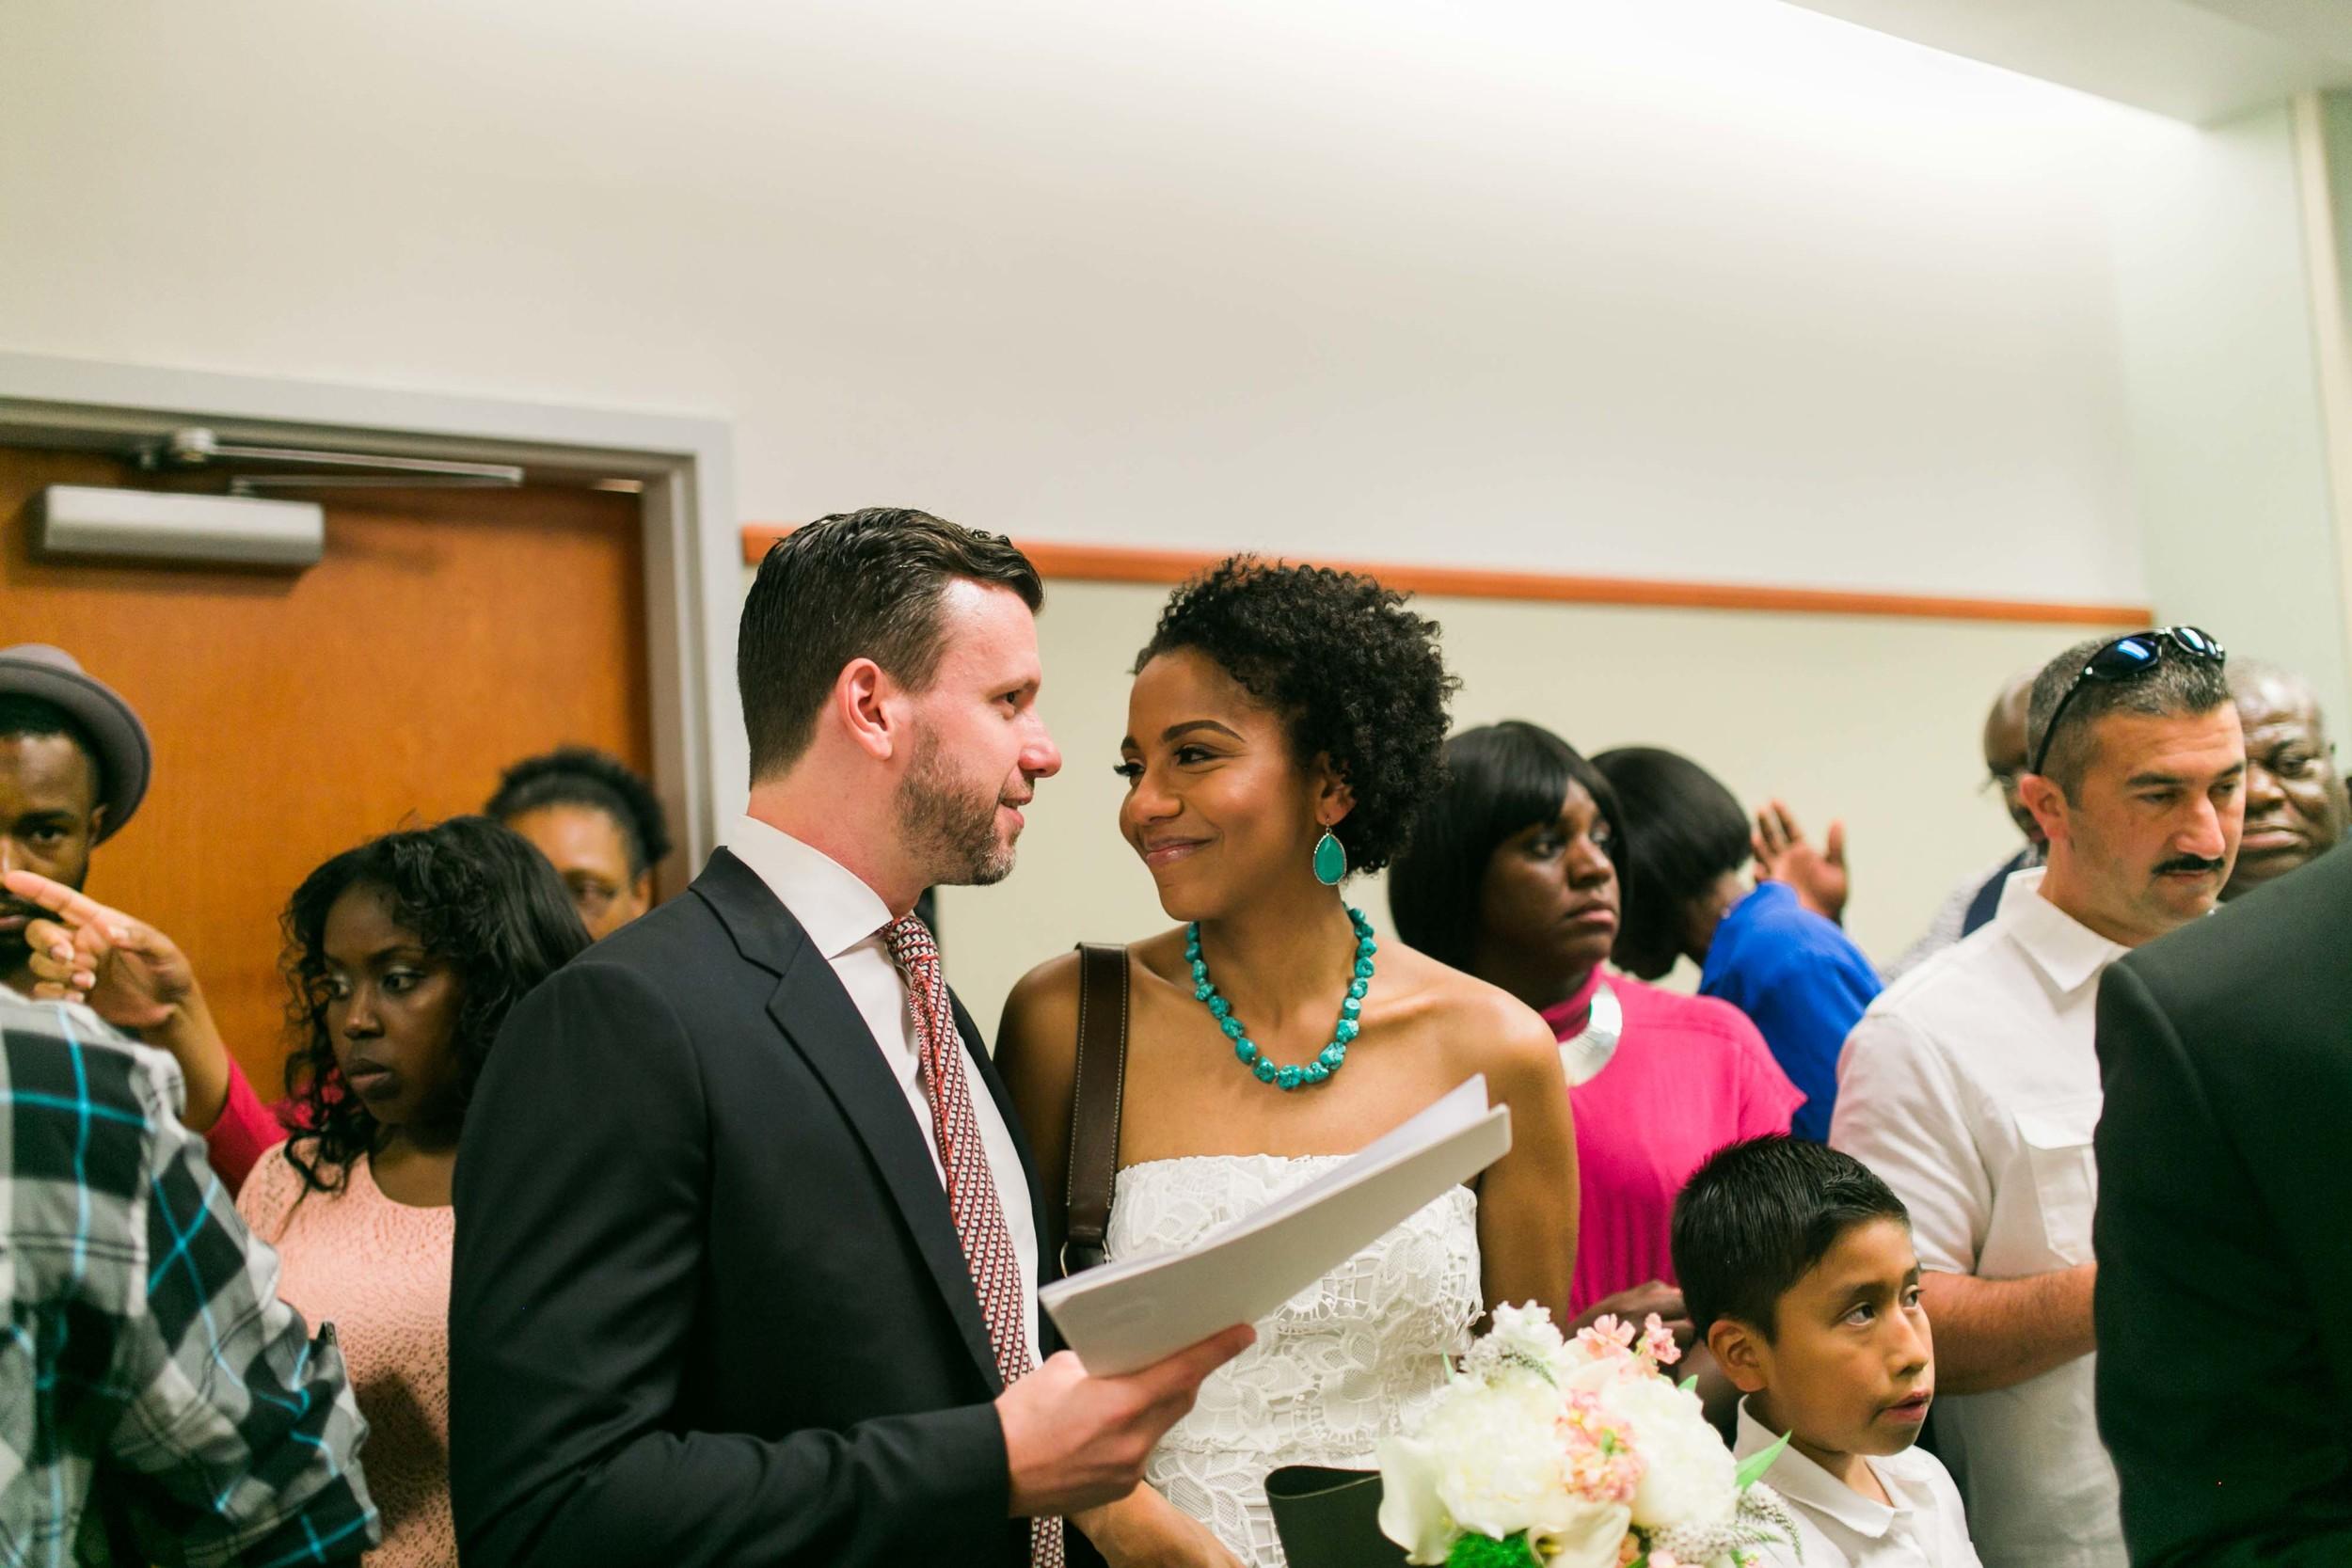 Dekalb-County-Courthouse-Wedding-Photos-Kiyah-C-Photography-33.jpg